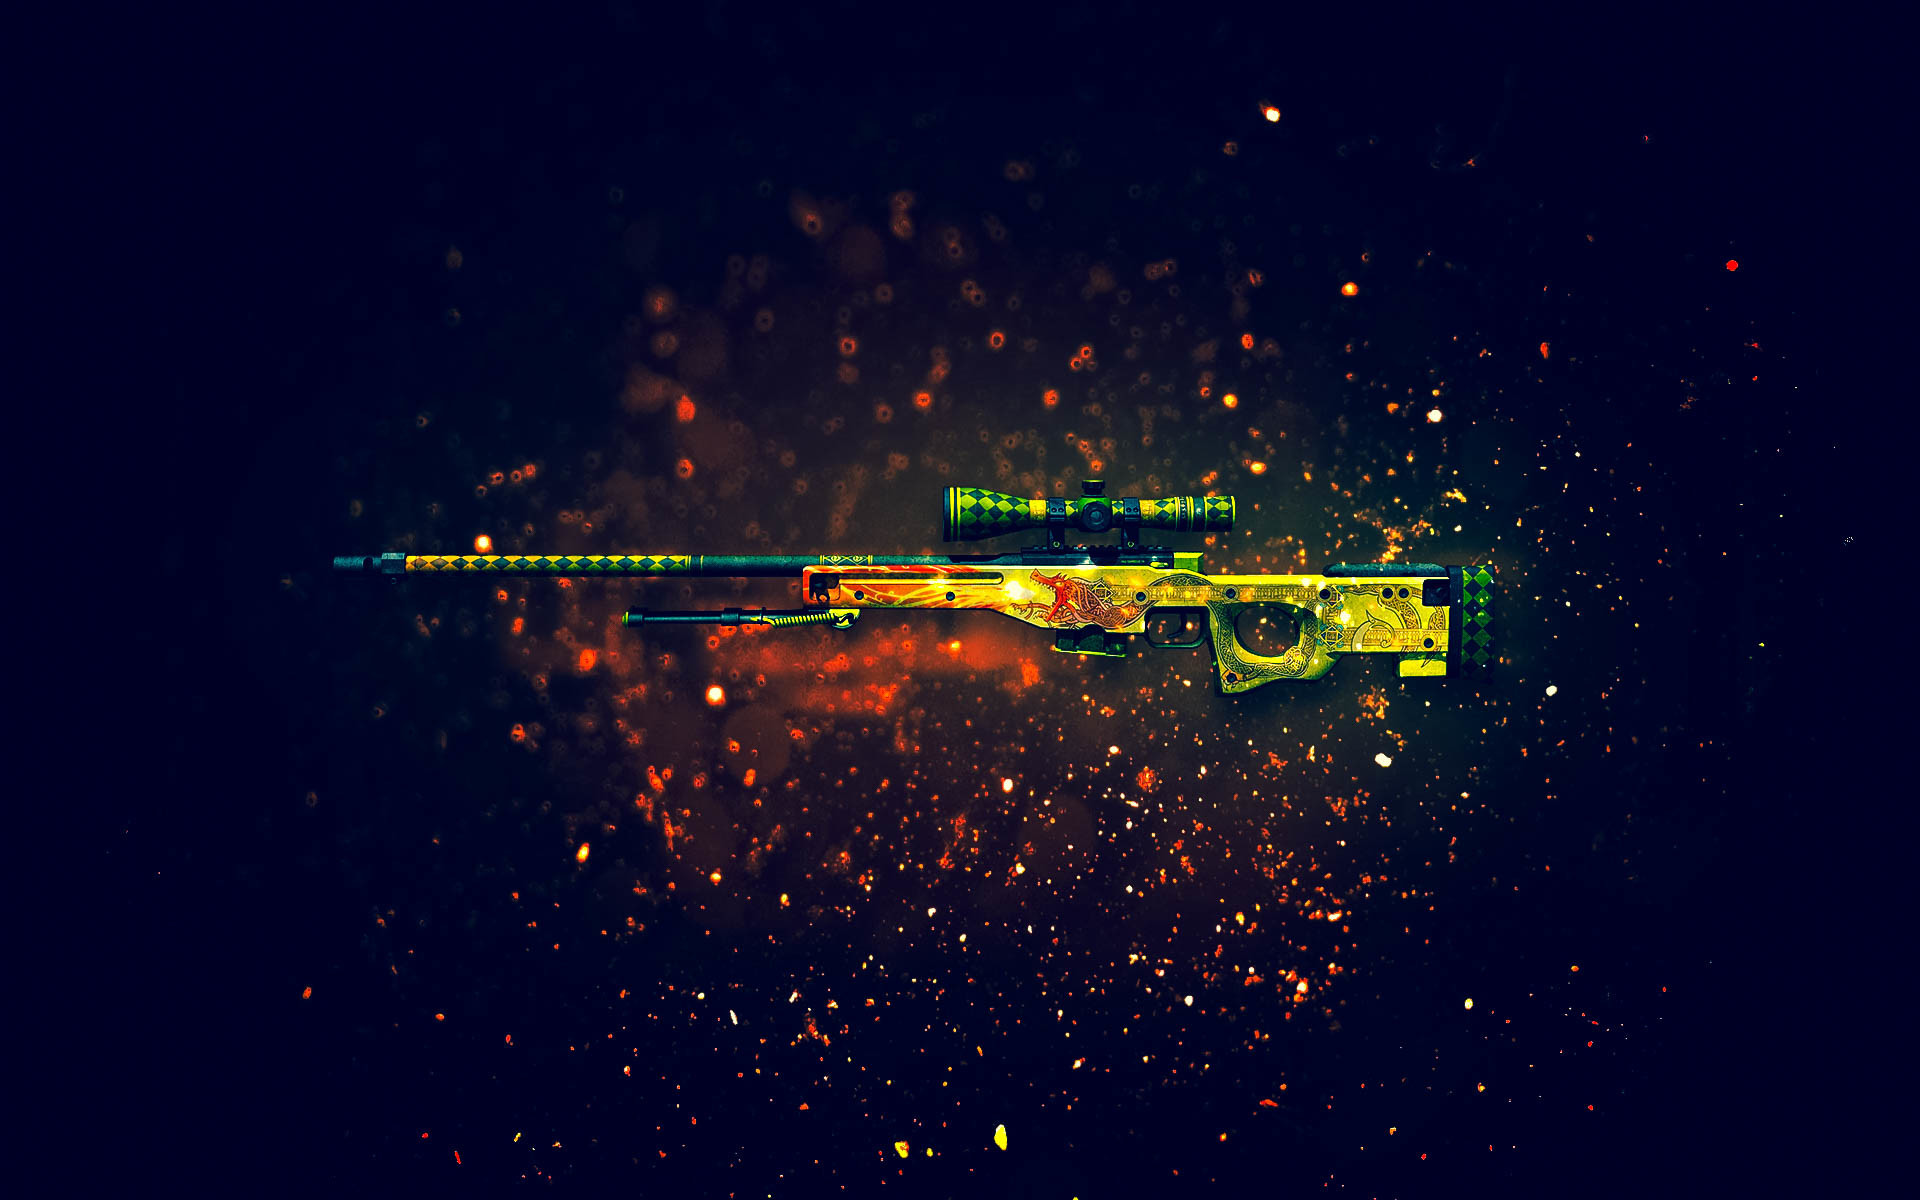 AK-47 | Aquamarine Revange | CS:GO | Skins | Pinterest | AK 47 and Video  games